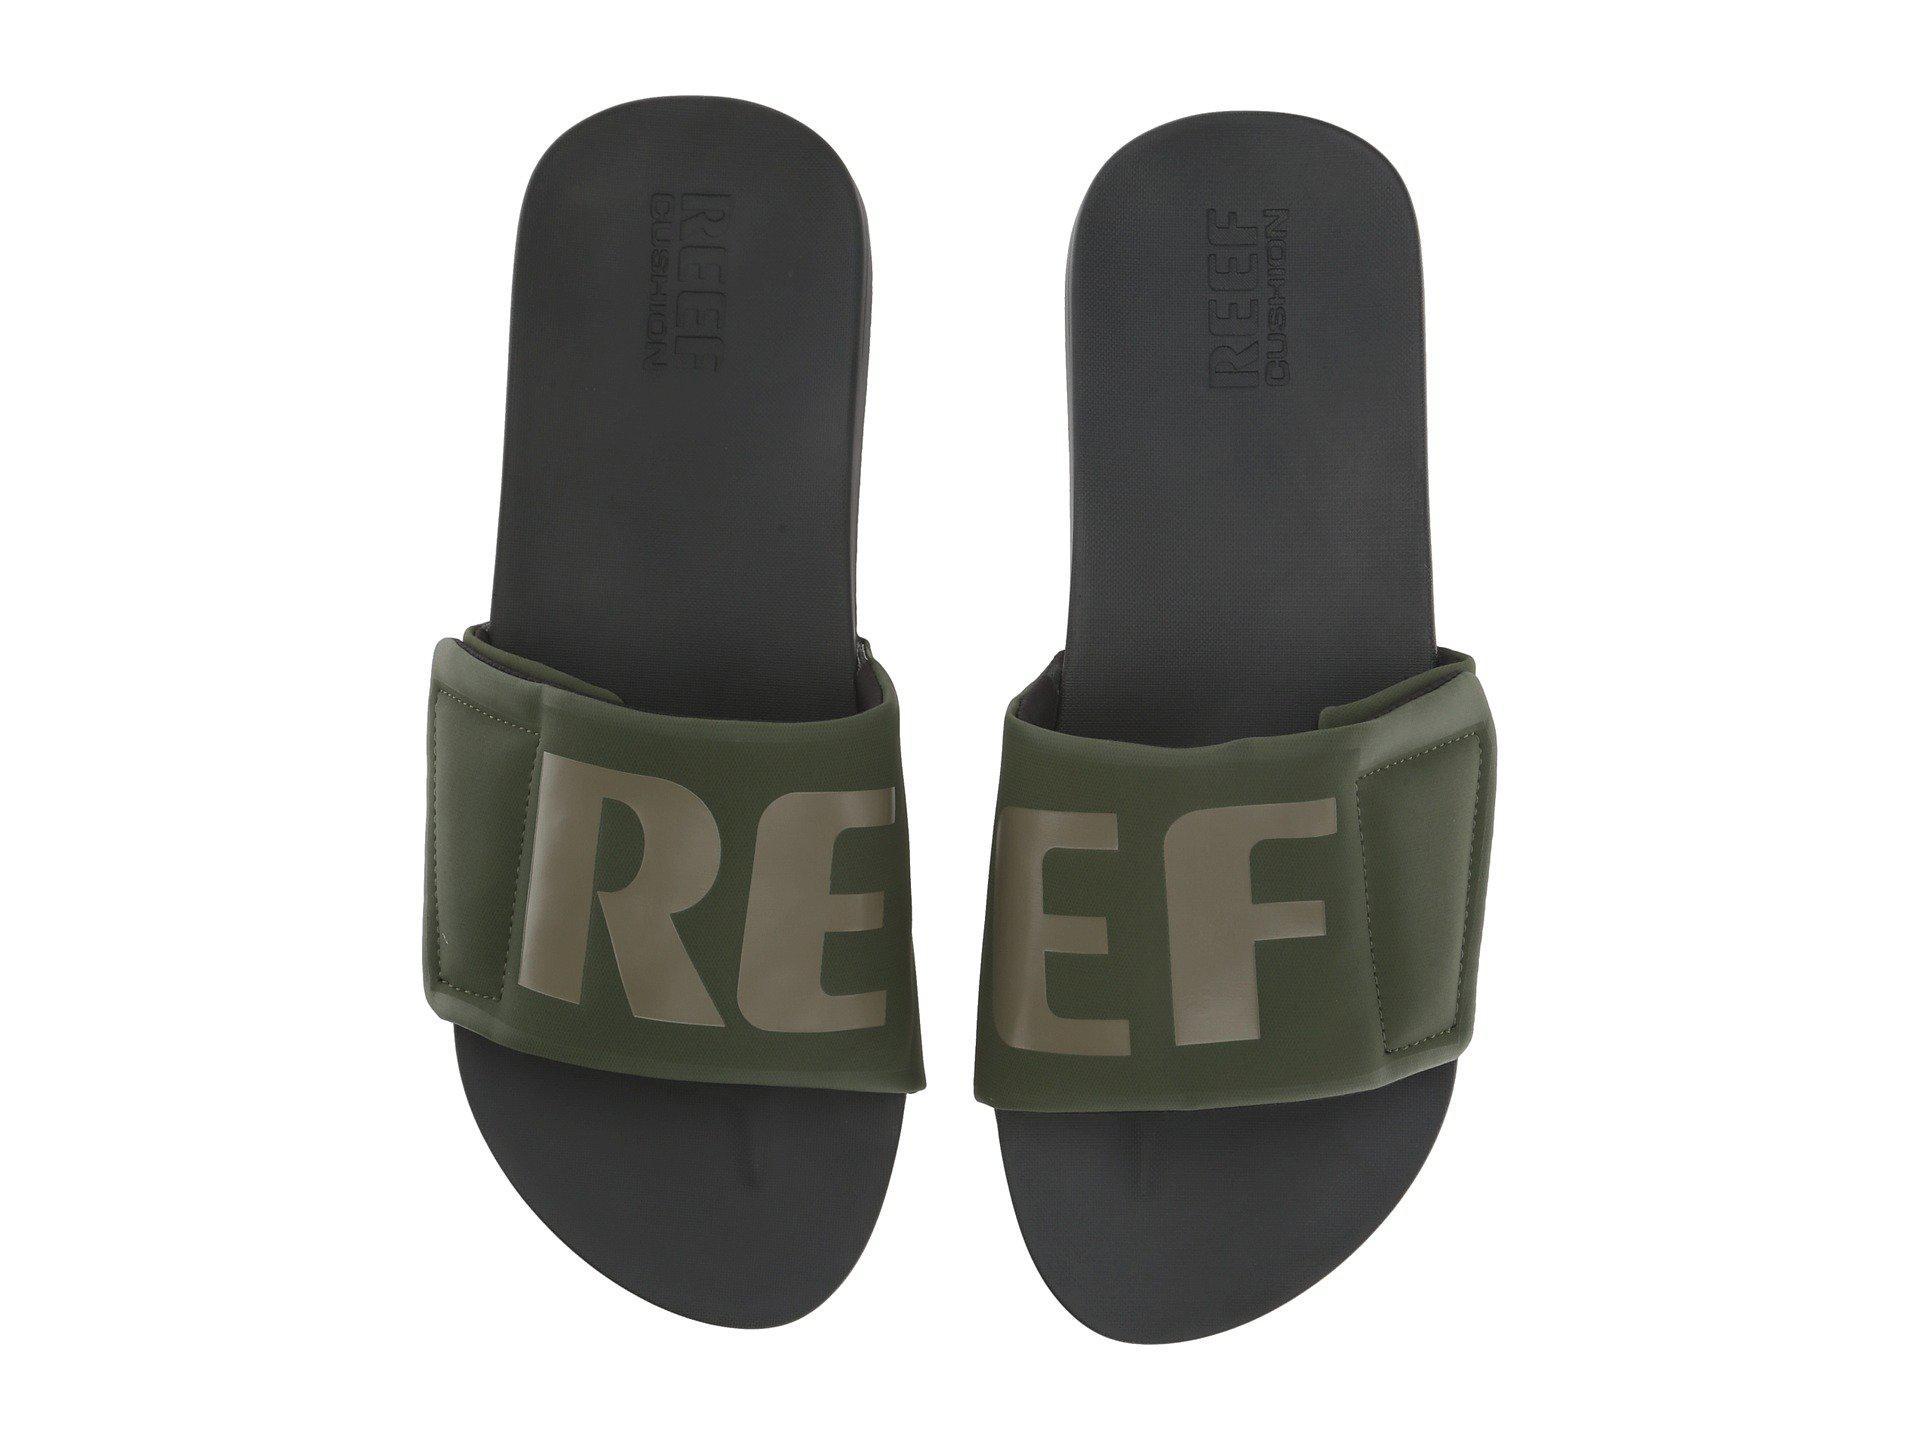 ee8a0136389 Reef - Gray Cushion Bounce Slide (black white logo) Men s Sandals for. View  fullscreen